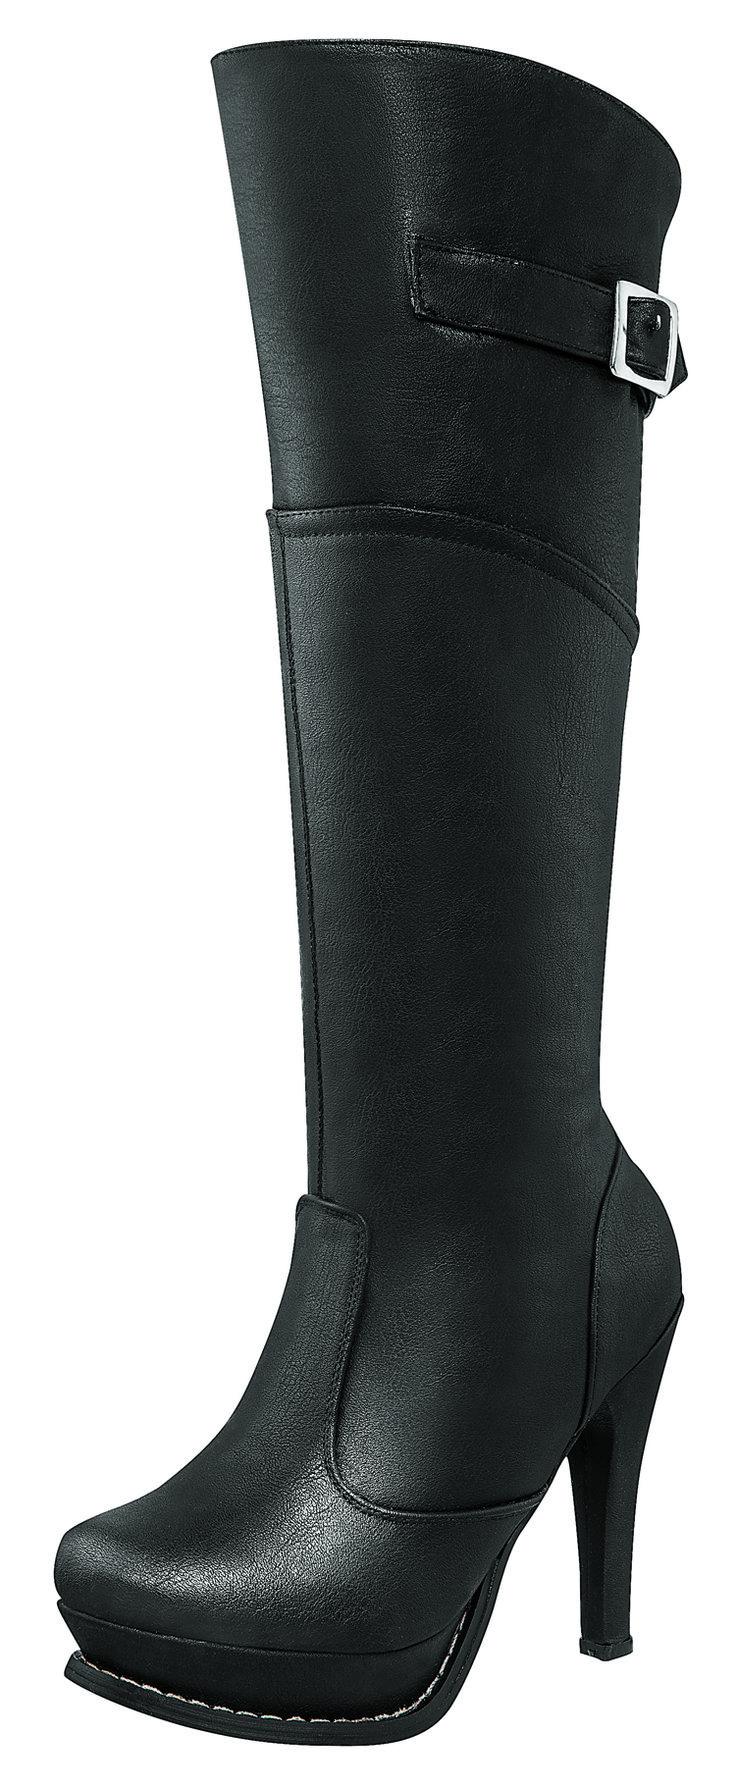 Botas para dama negras #tendencias #dama #moda #invierno